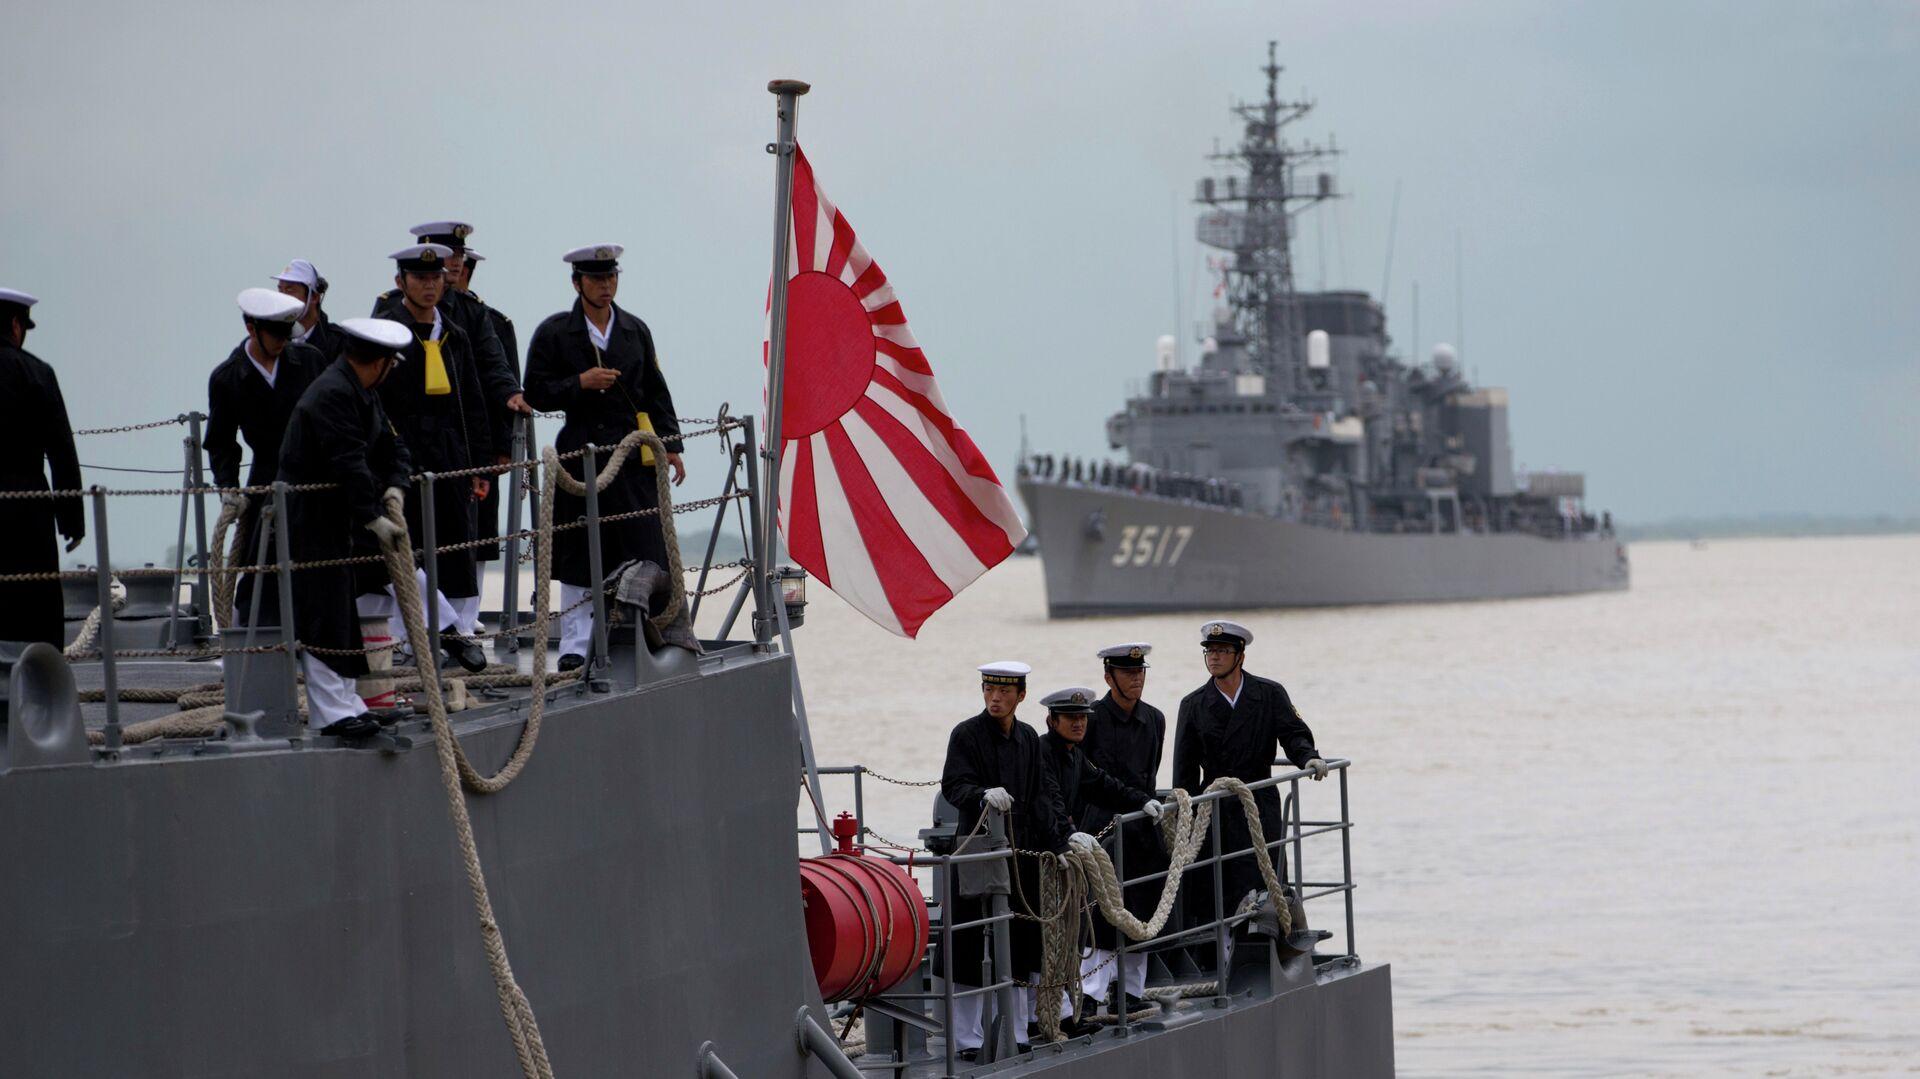 Japanese navy officers stand on the deck of Japan Maritime Self-Defense Force's vessel docked at Thilawa port, Myanmar, Monday, Sept. 30, 2013 - Sputnik Mundo, 1920, 19.03.2021